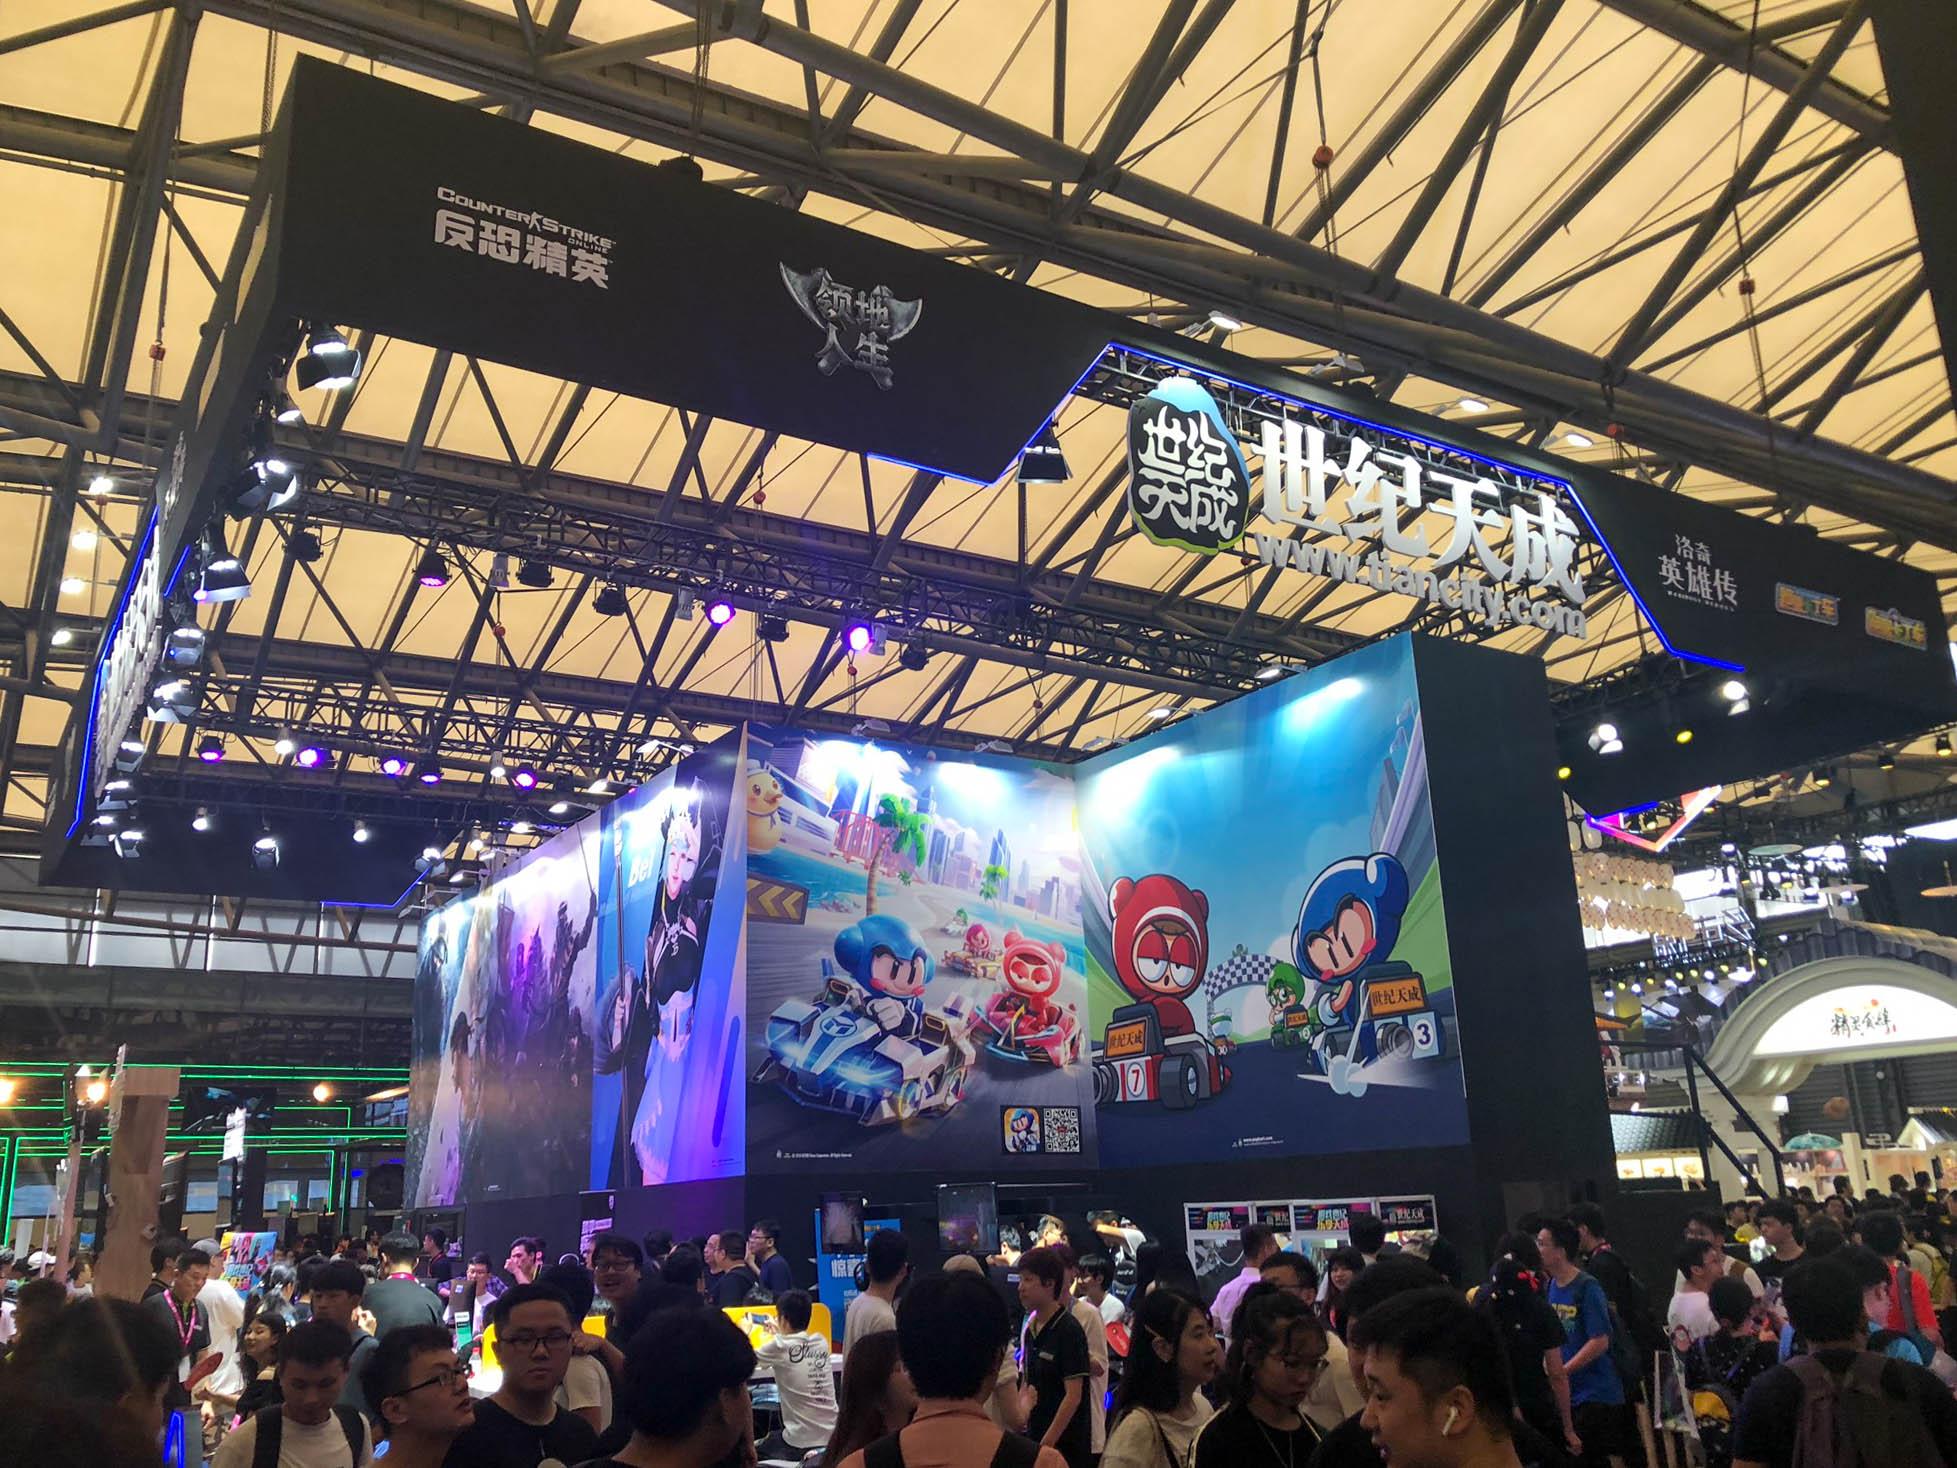 2019 ChinaJoy 中国国际数码互动娱乐展览会 游玩 第39张